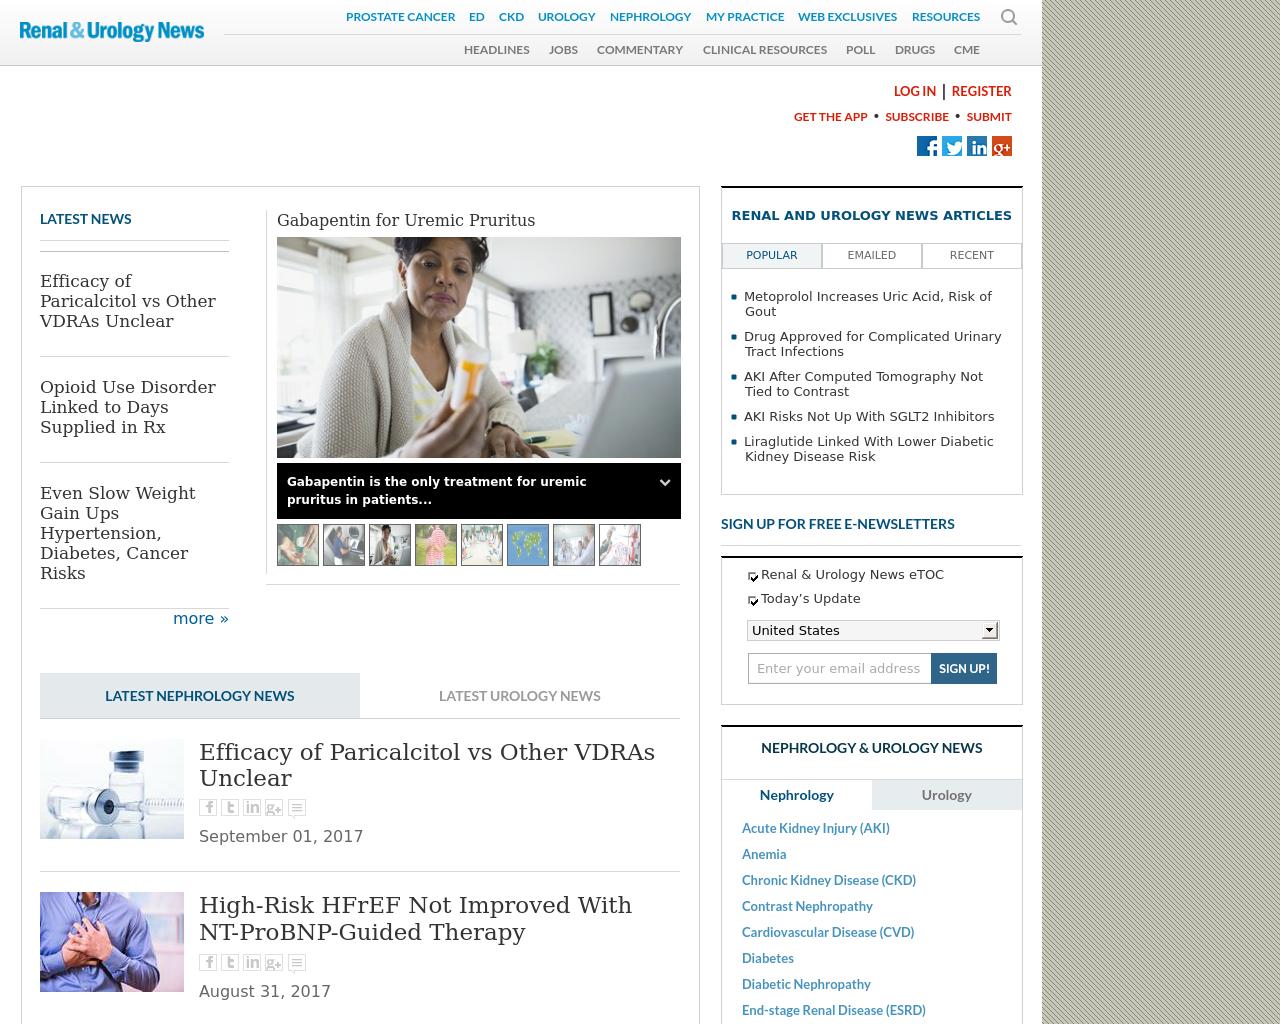 RENAL-&-UROLOGY-NEWS-Advertising-Reviews-Pricing